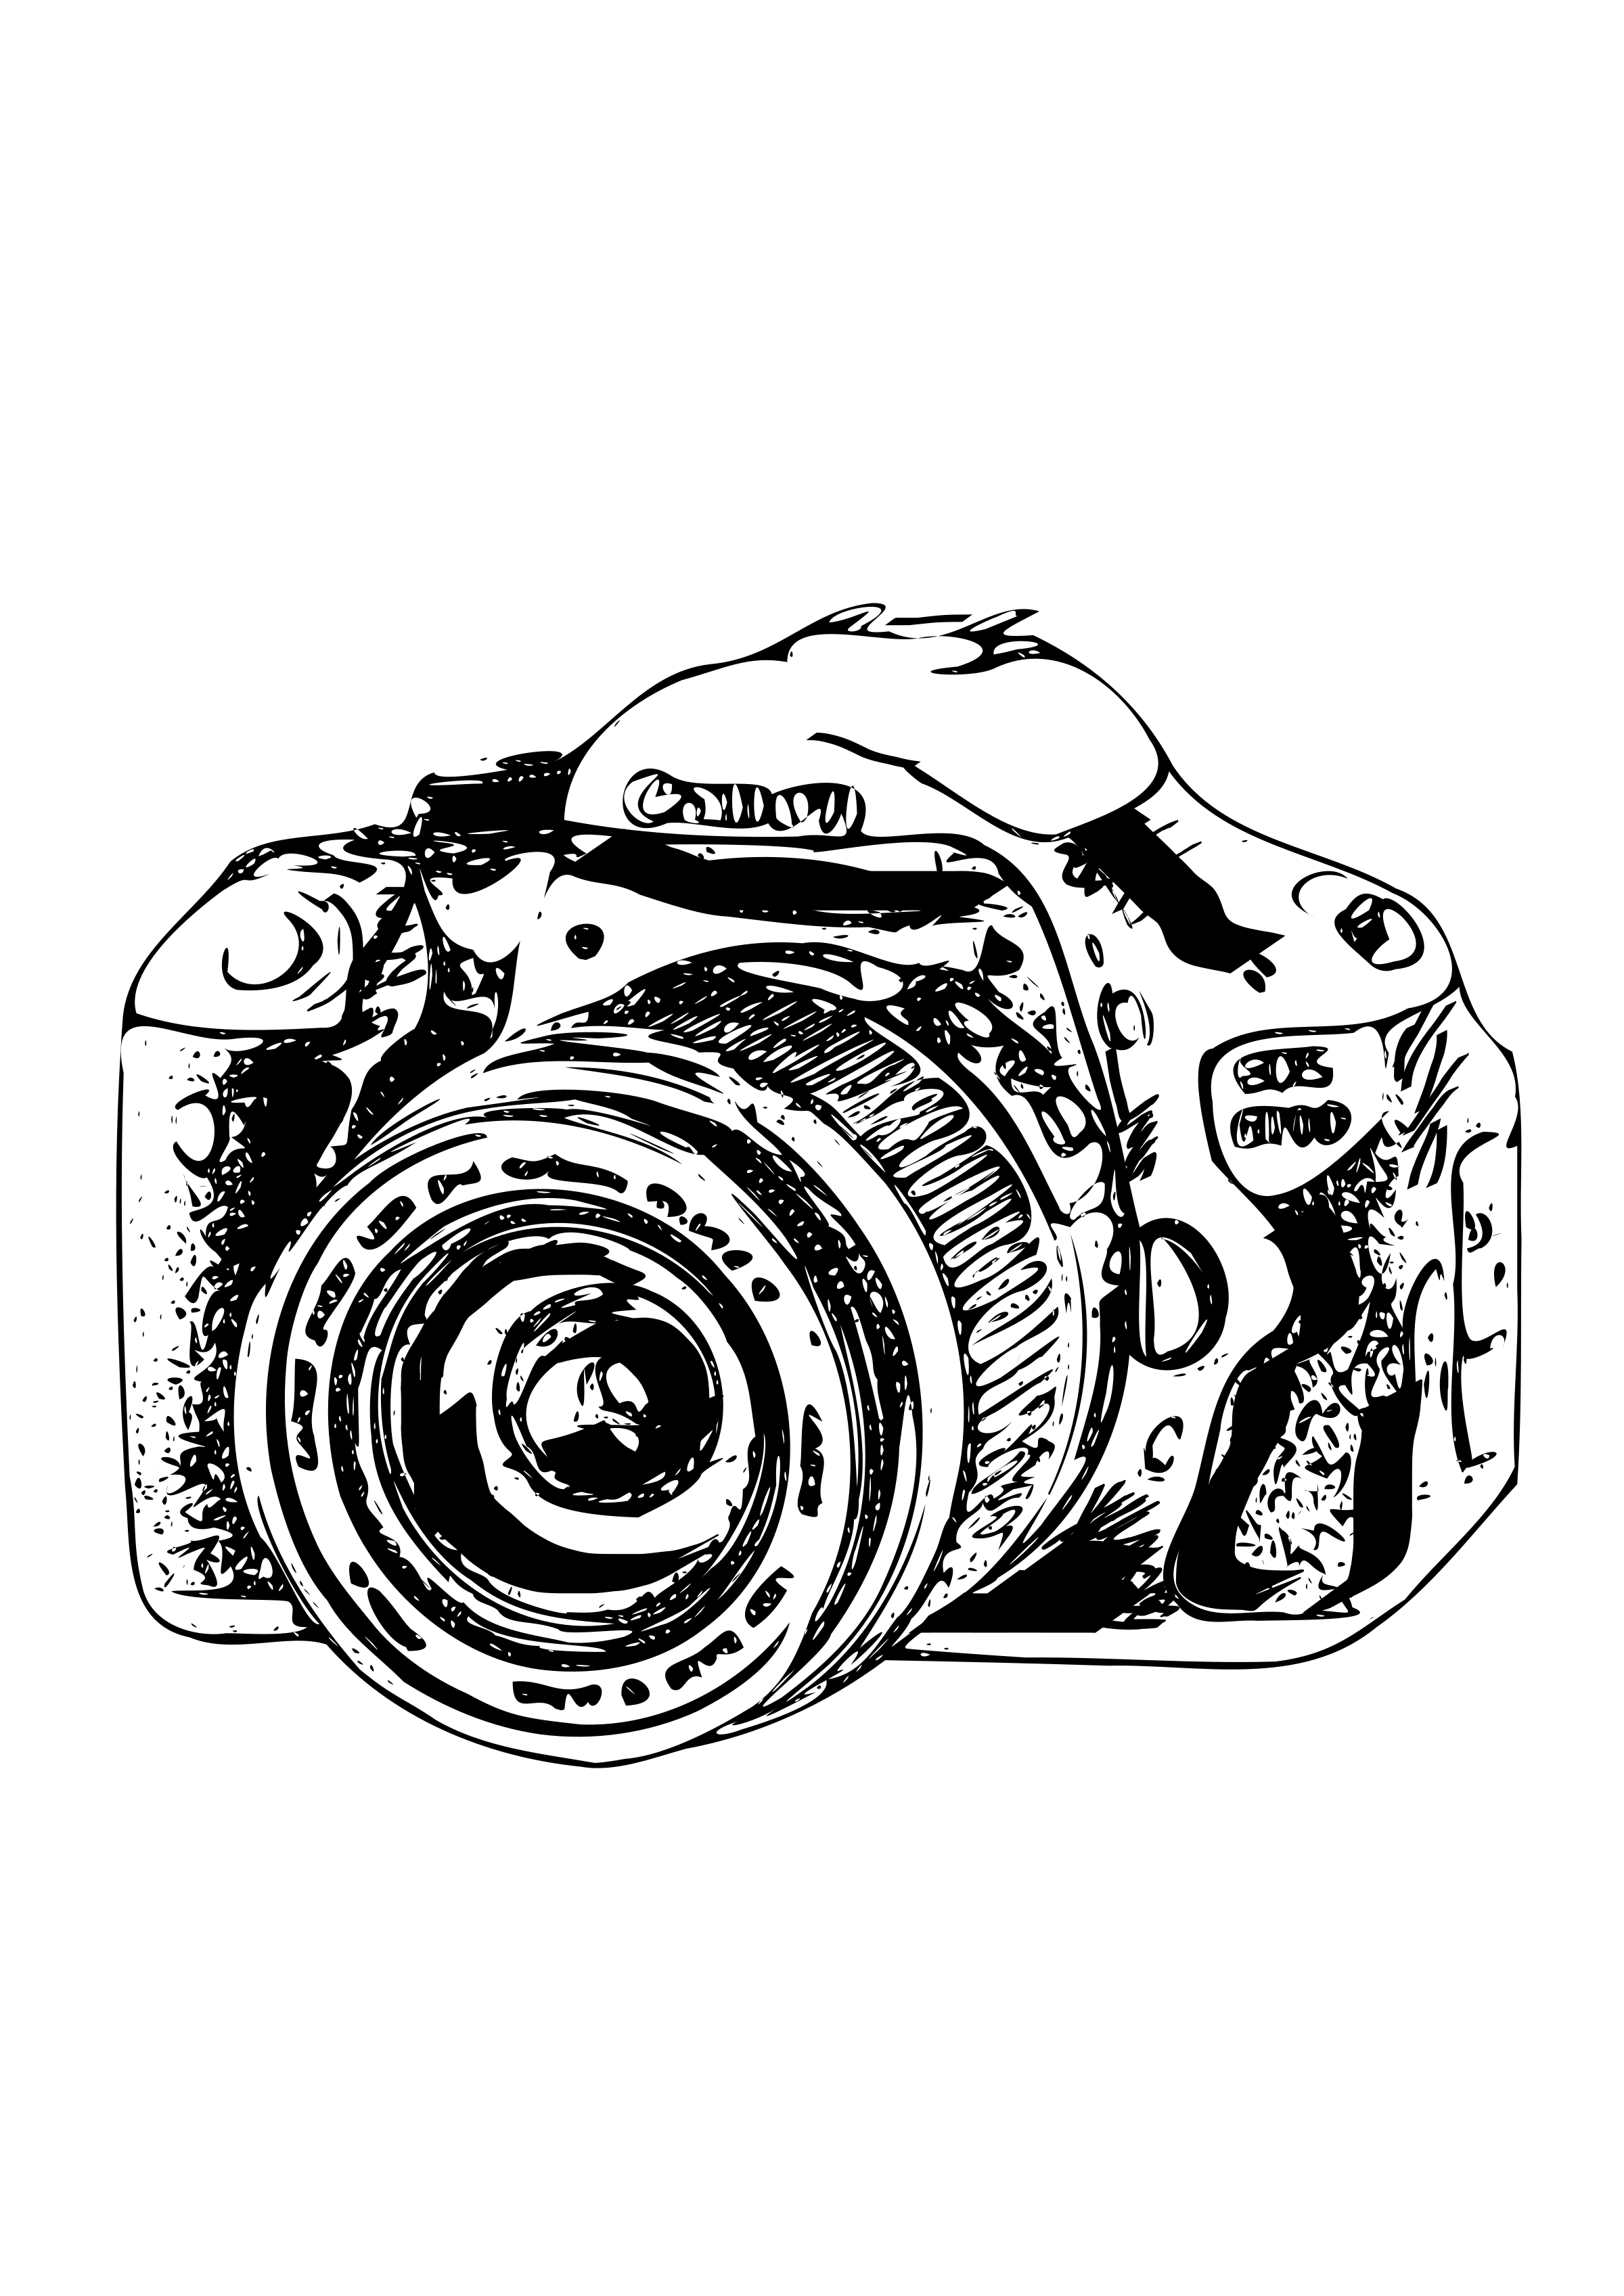 Camera clip art sketch. Clipart canon big image